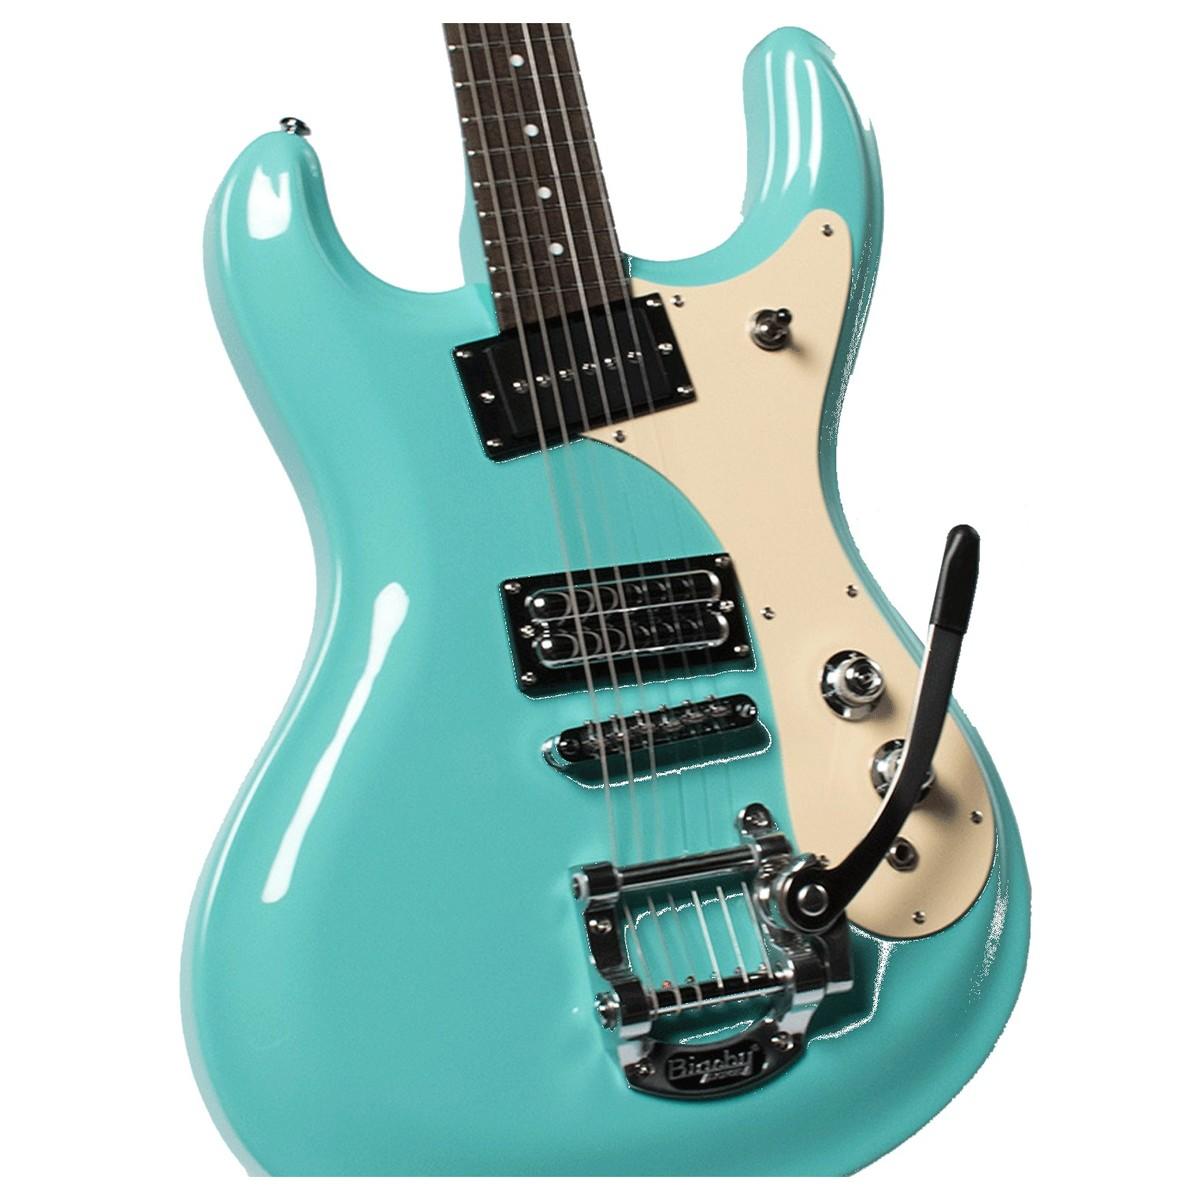 aqua hair dark guitar - photo #17